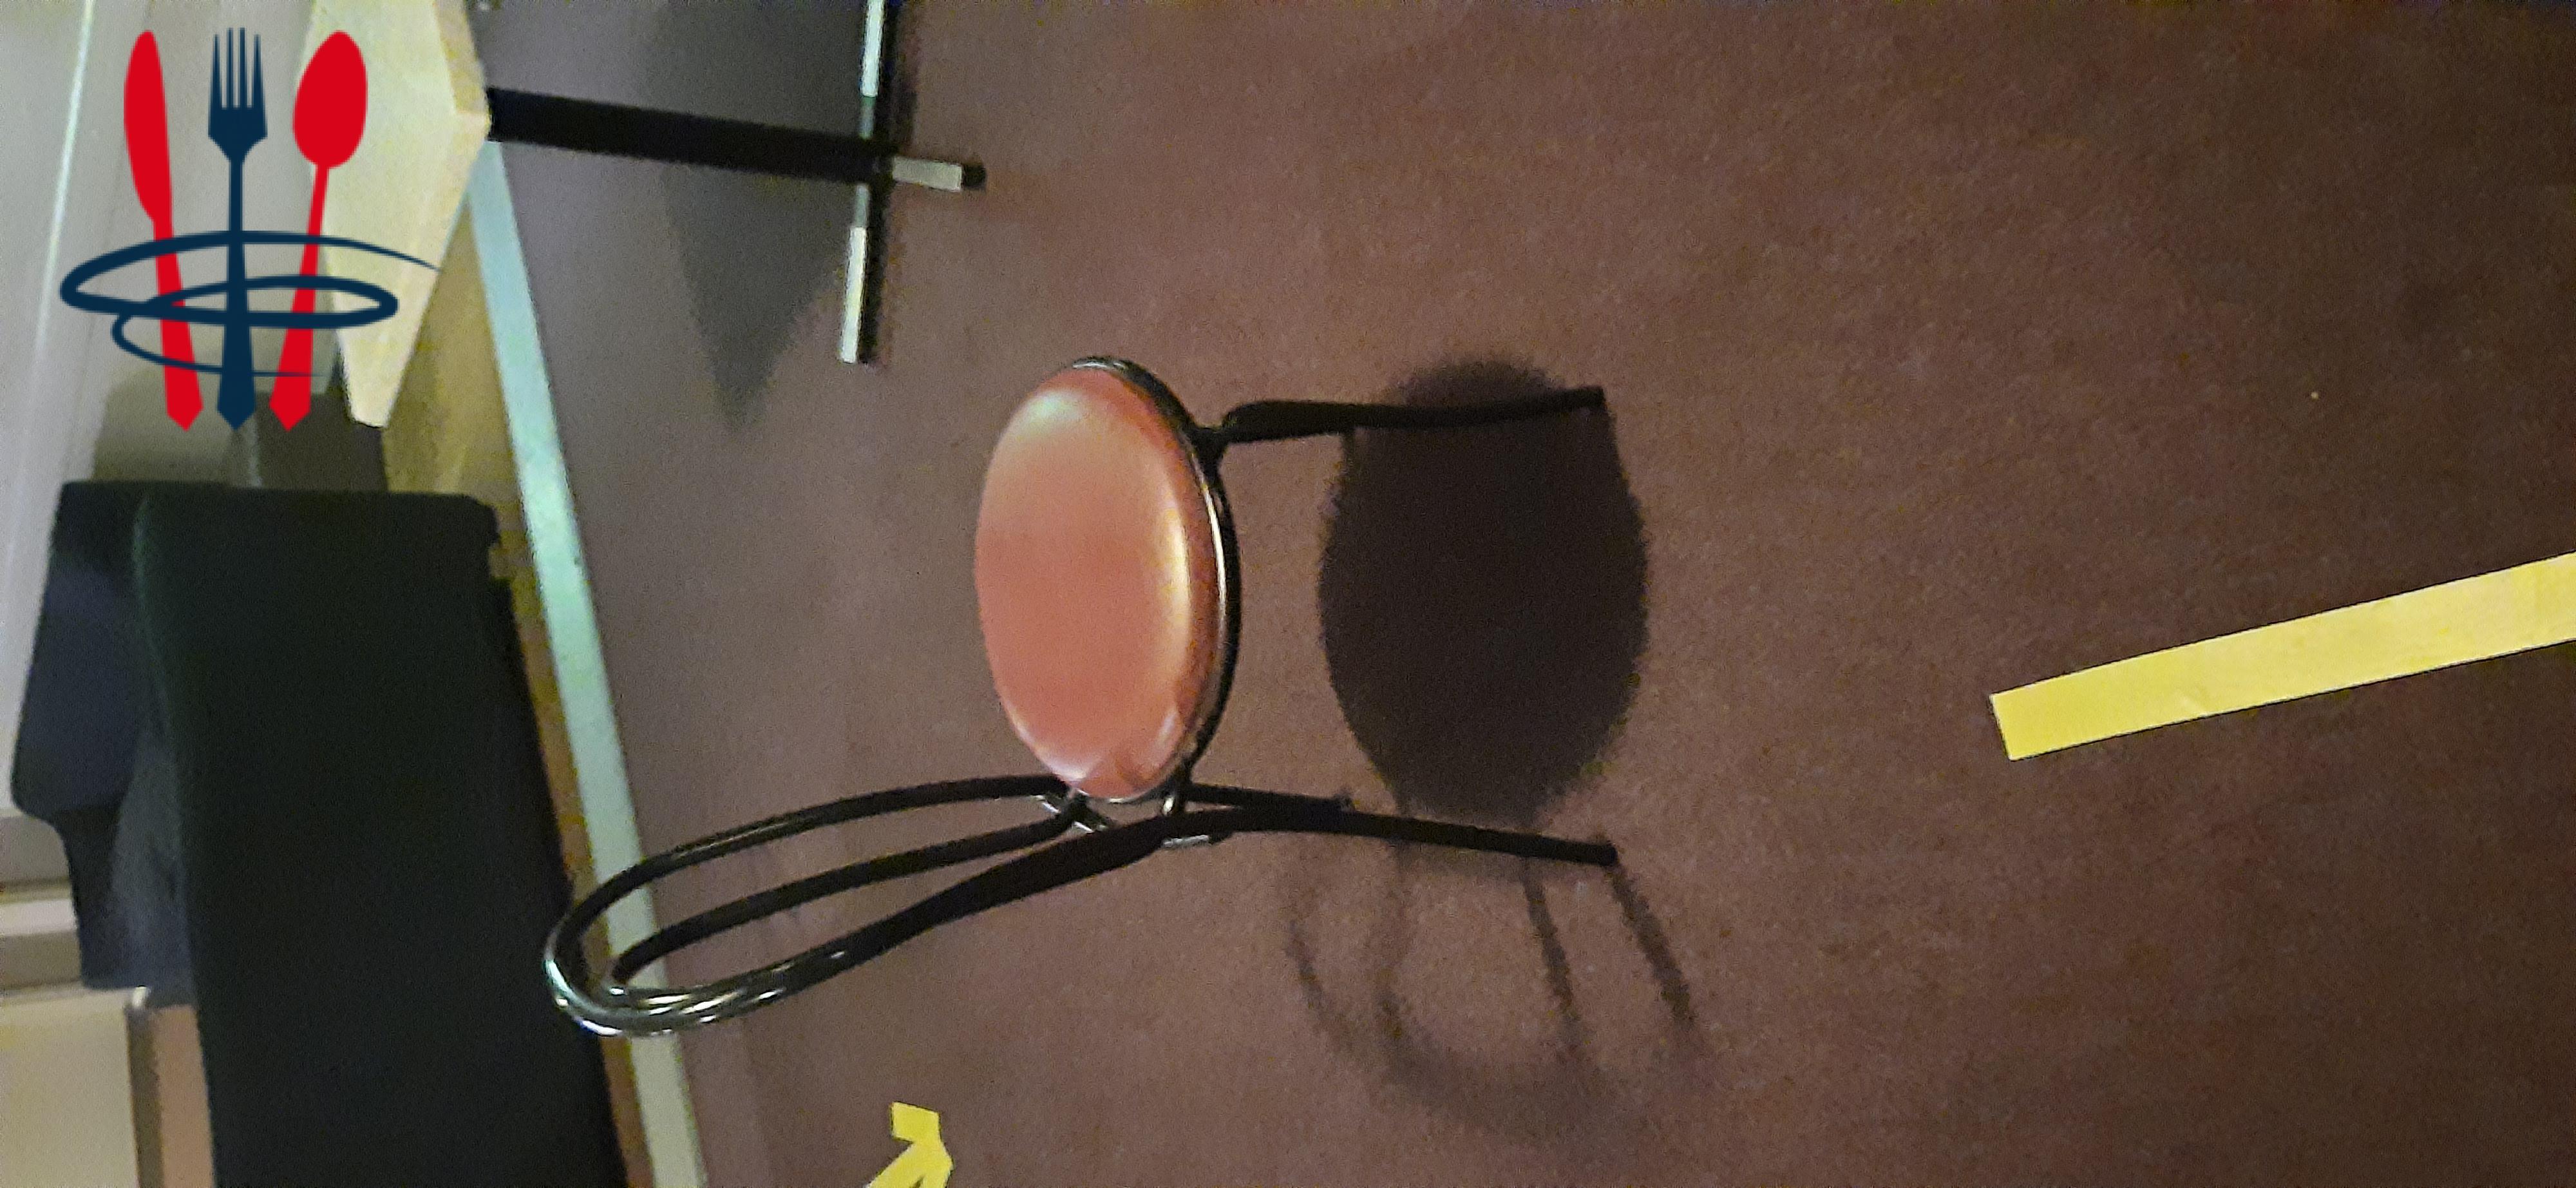 A vendre Chaise restauration